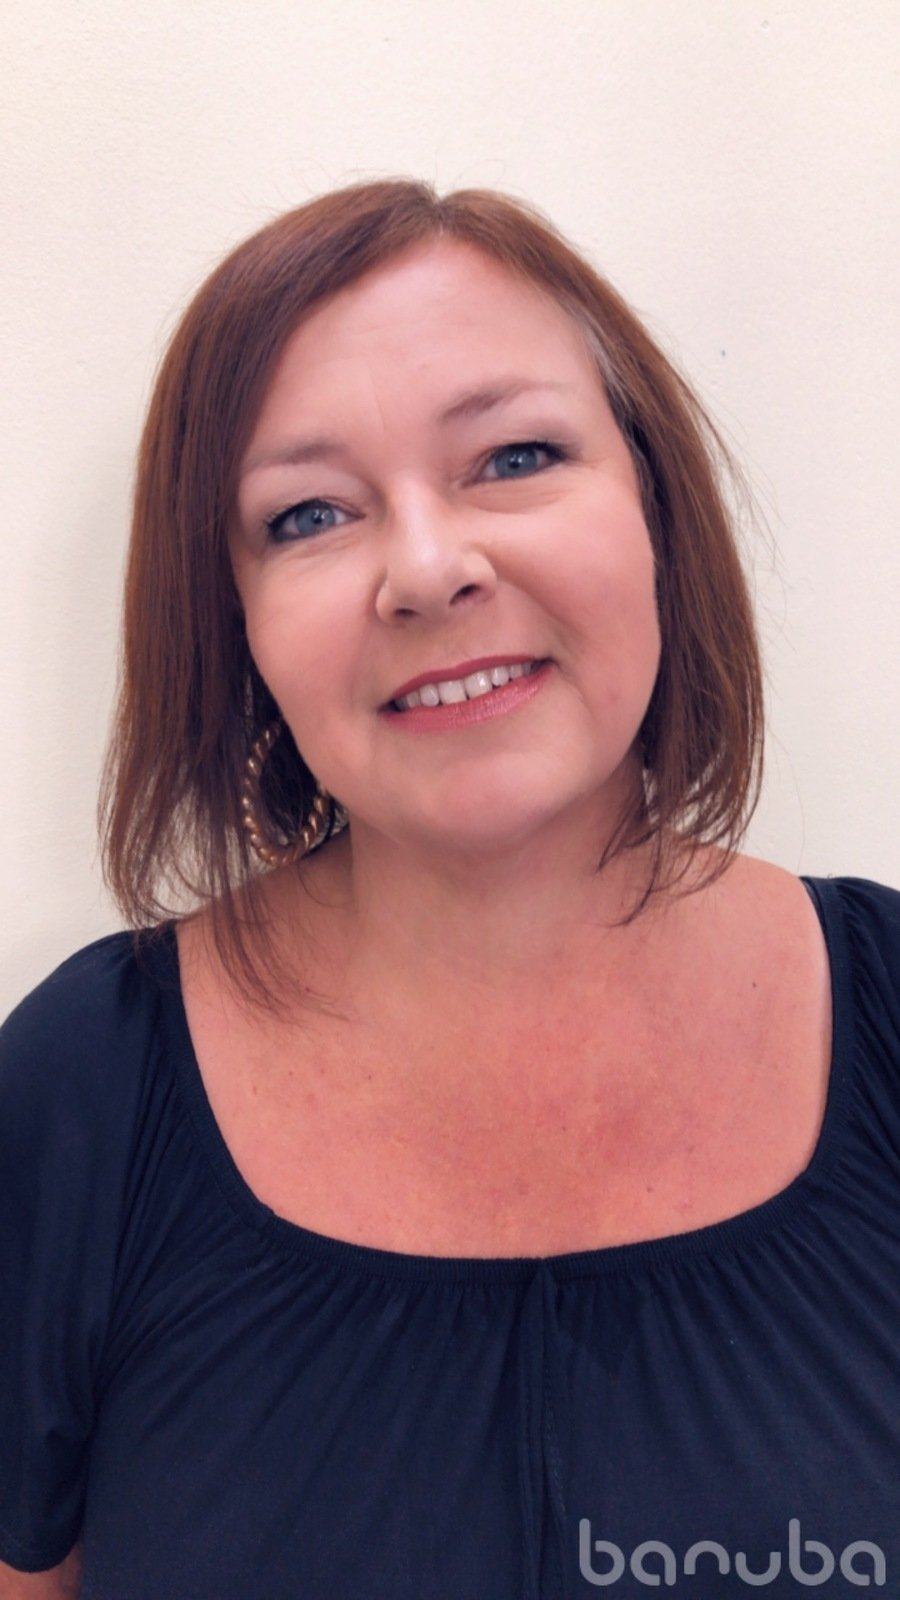 School Administrator - Mrs Maynard